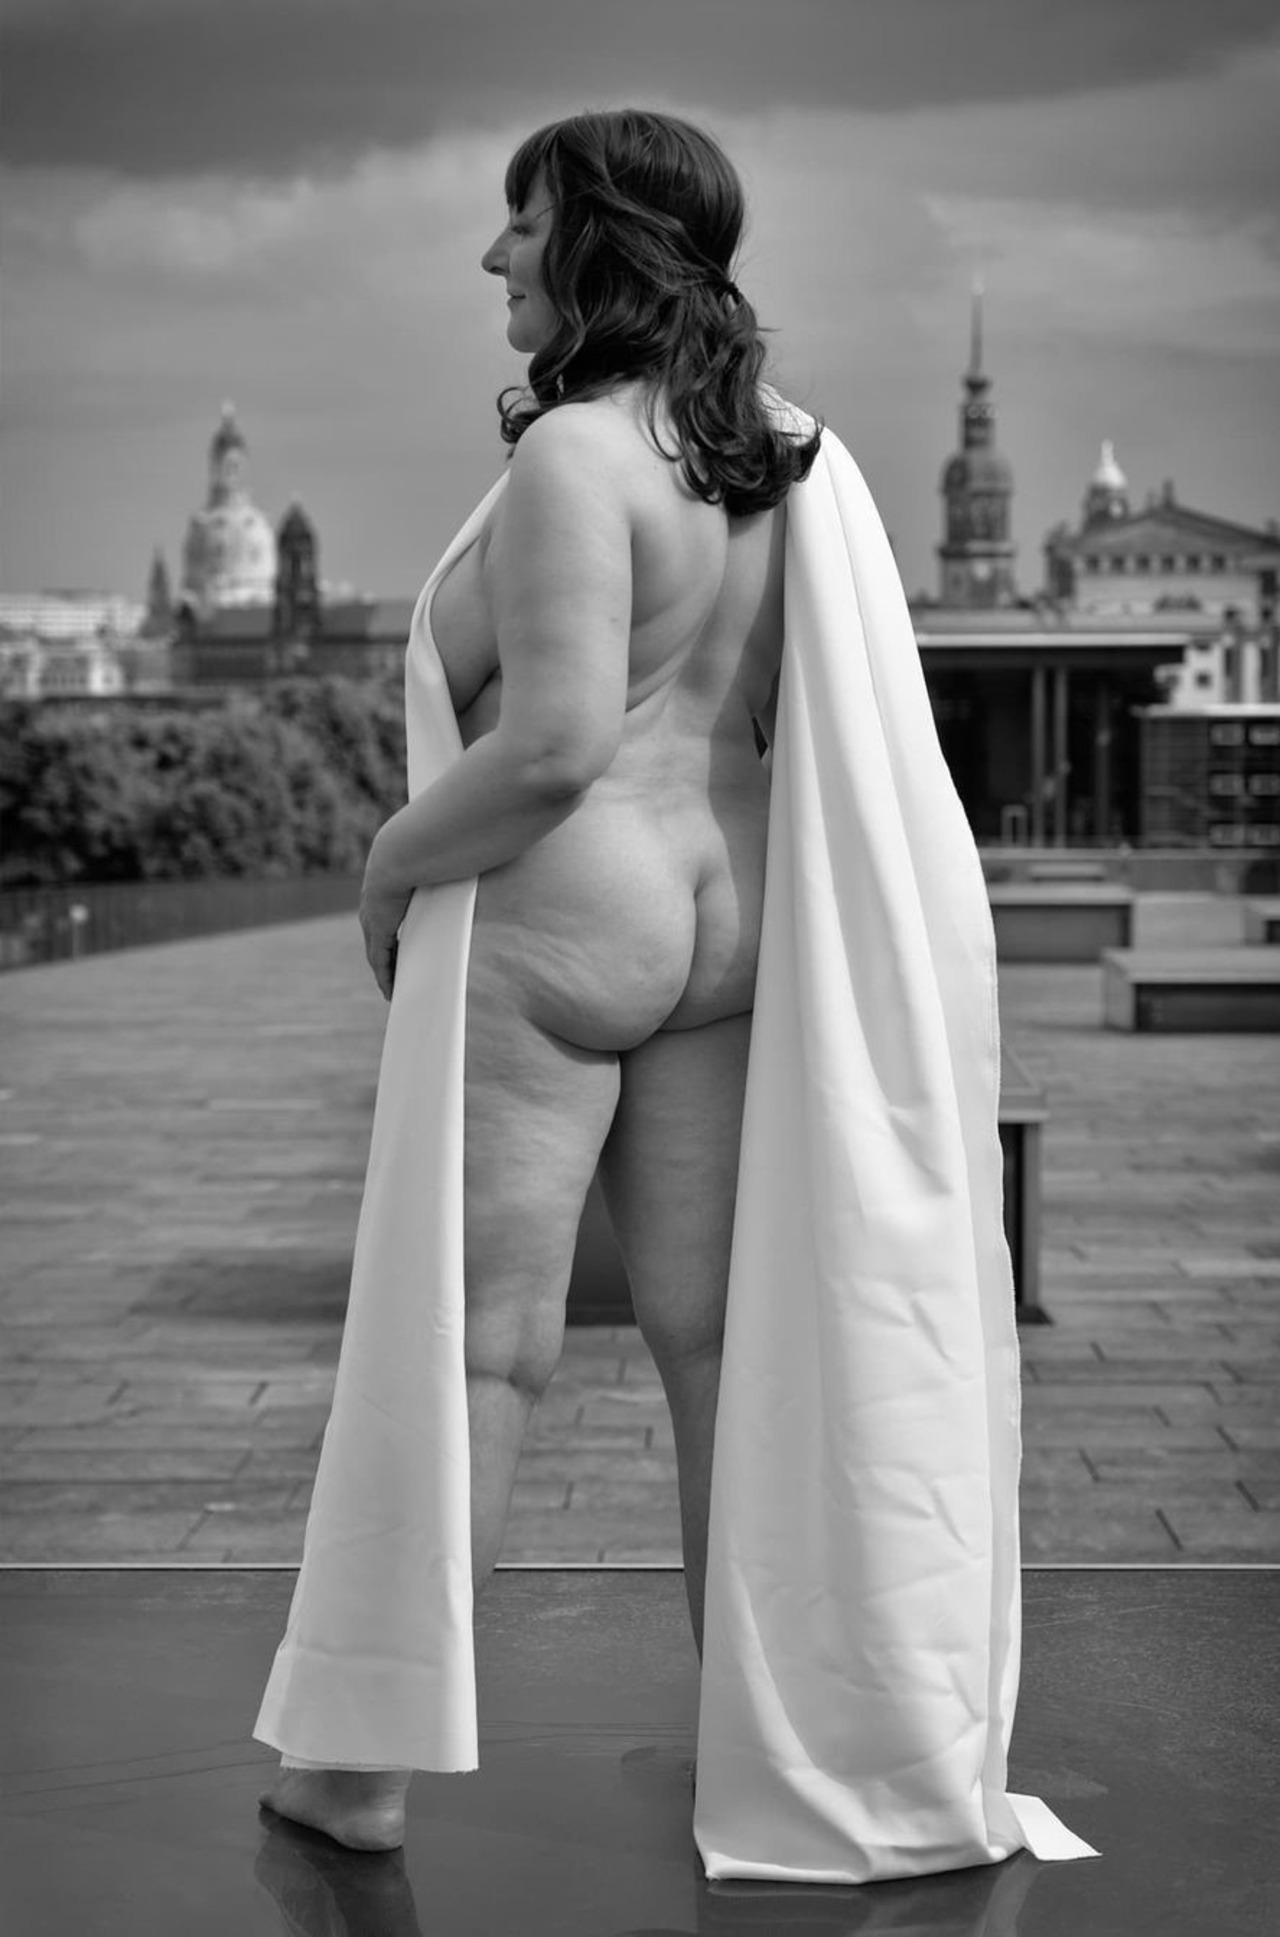 Manuela_schusser1